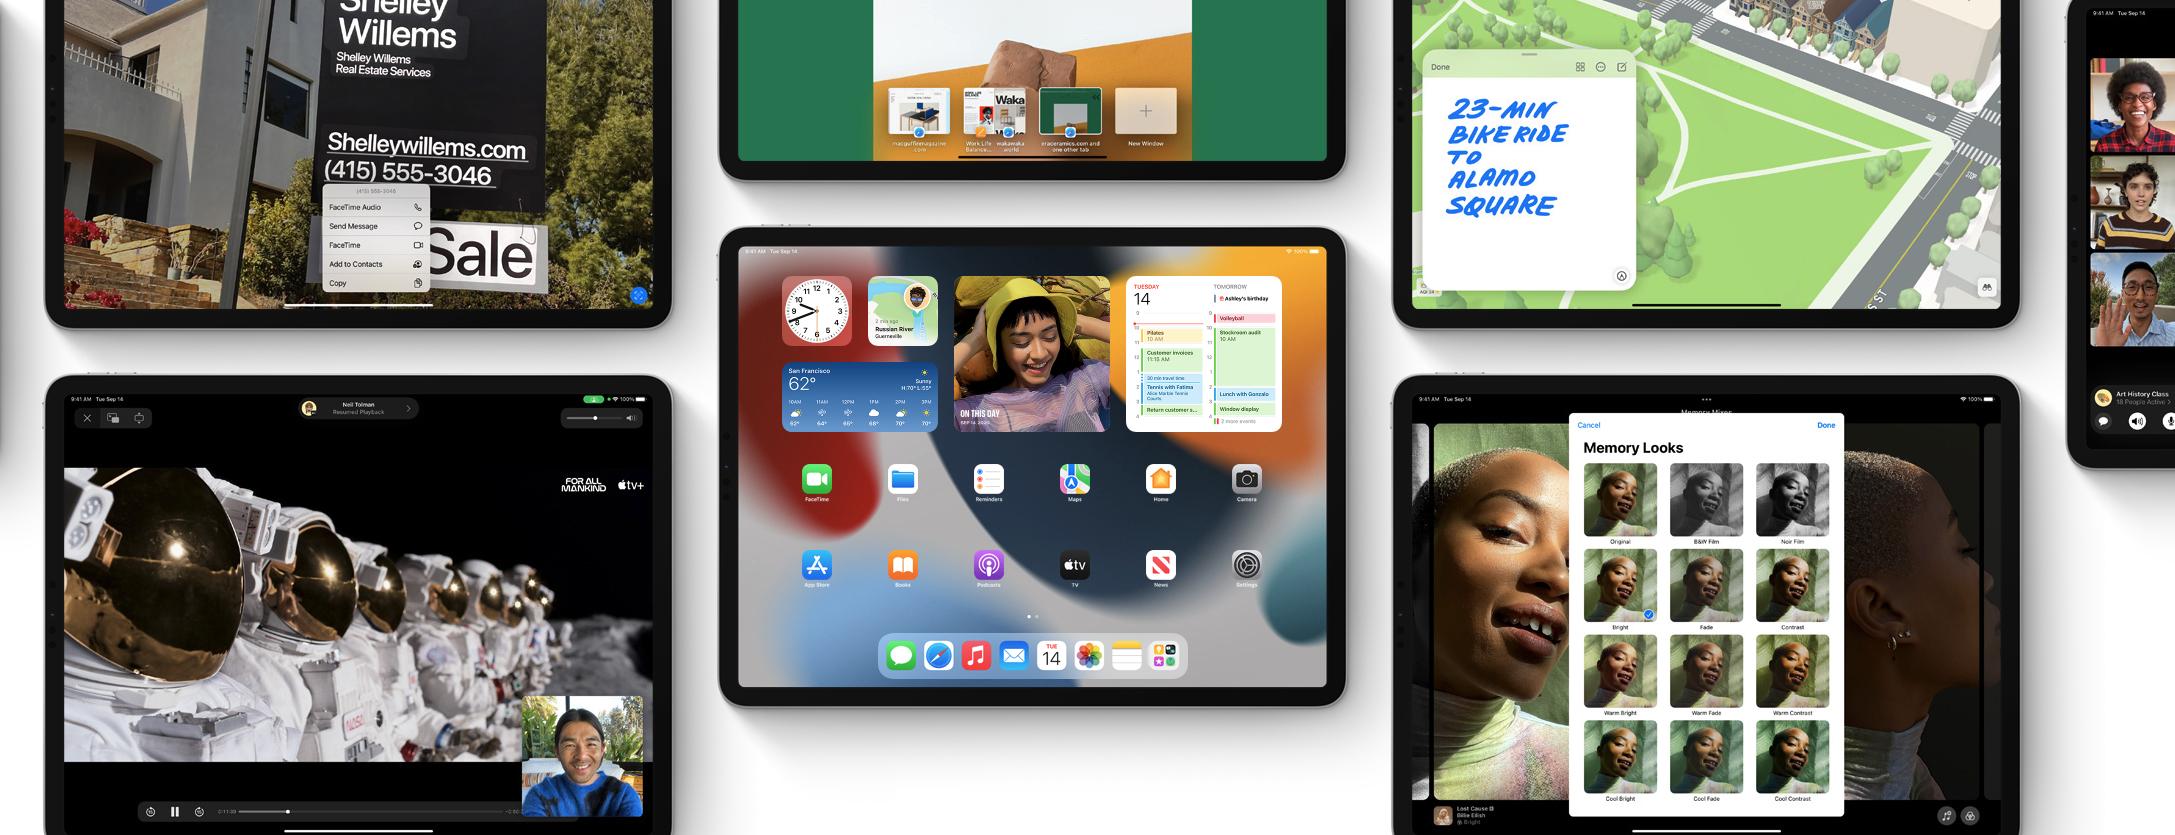 photo of Apple's iPadOS 15 Offers Better Multitasking, New Widgets image